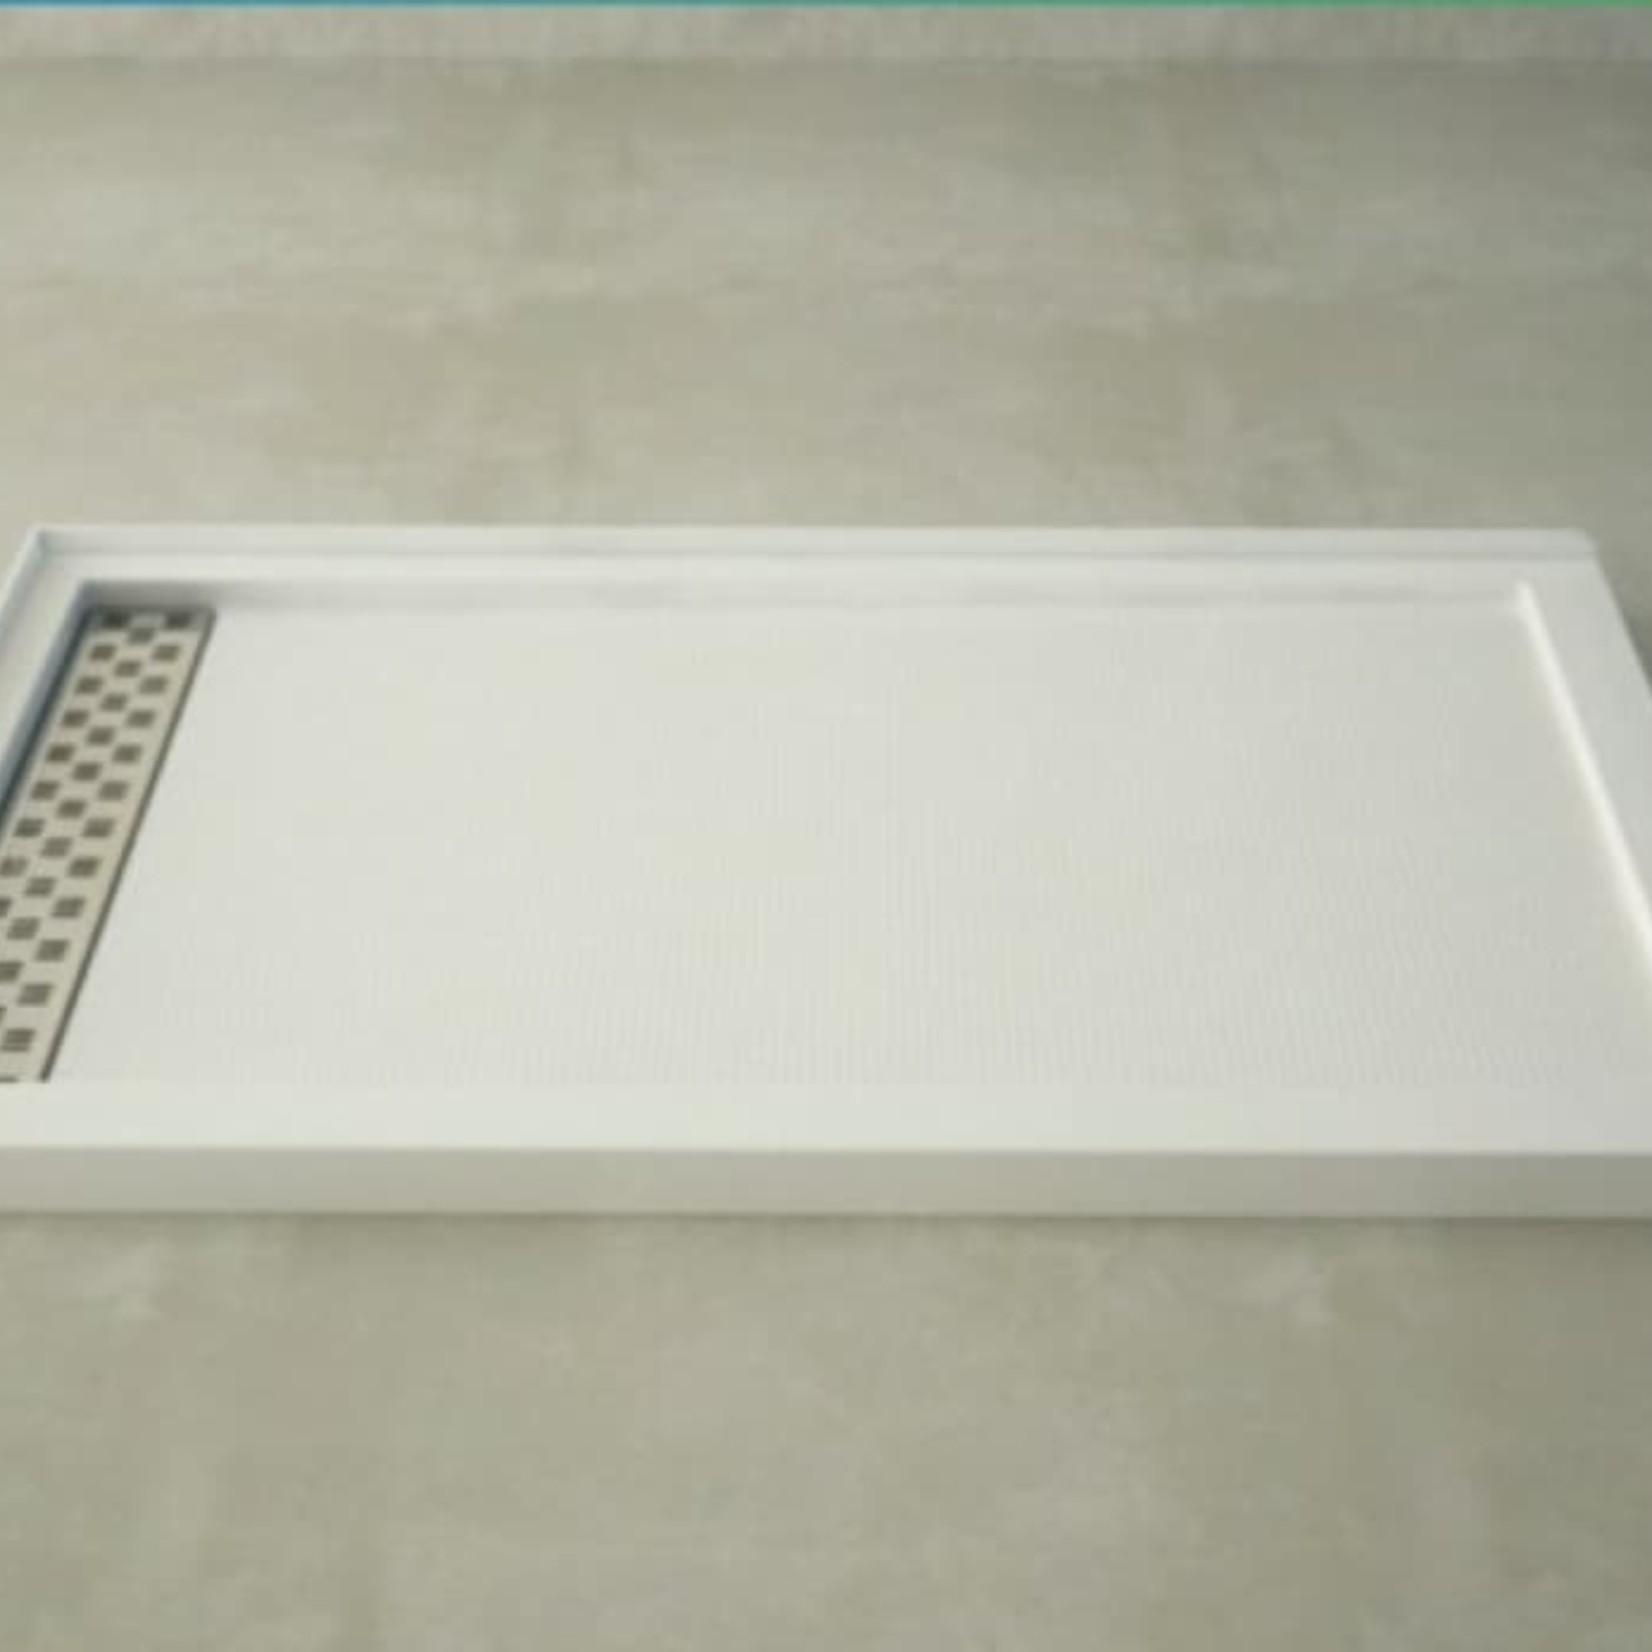 Shower base 60 '' x 36 '' straight linear drain CDC7808R